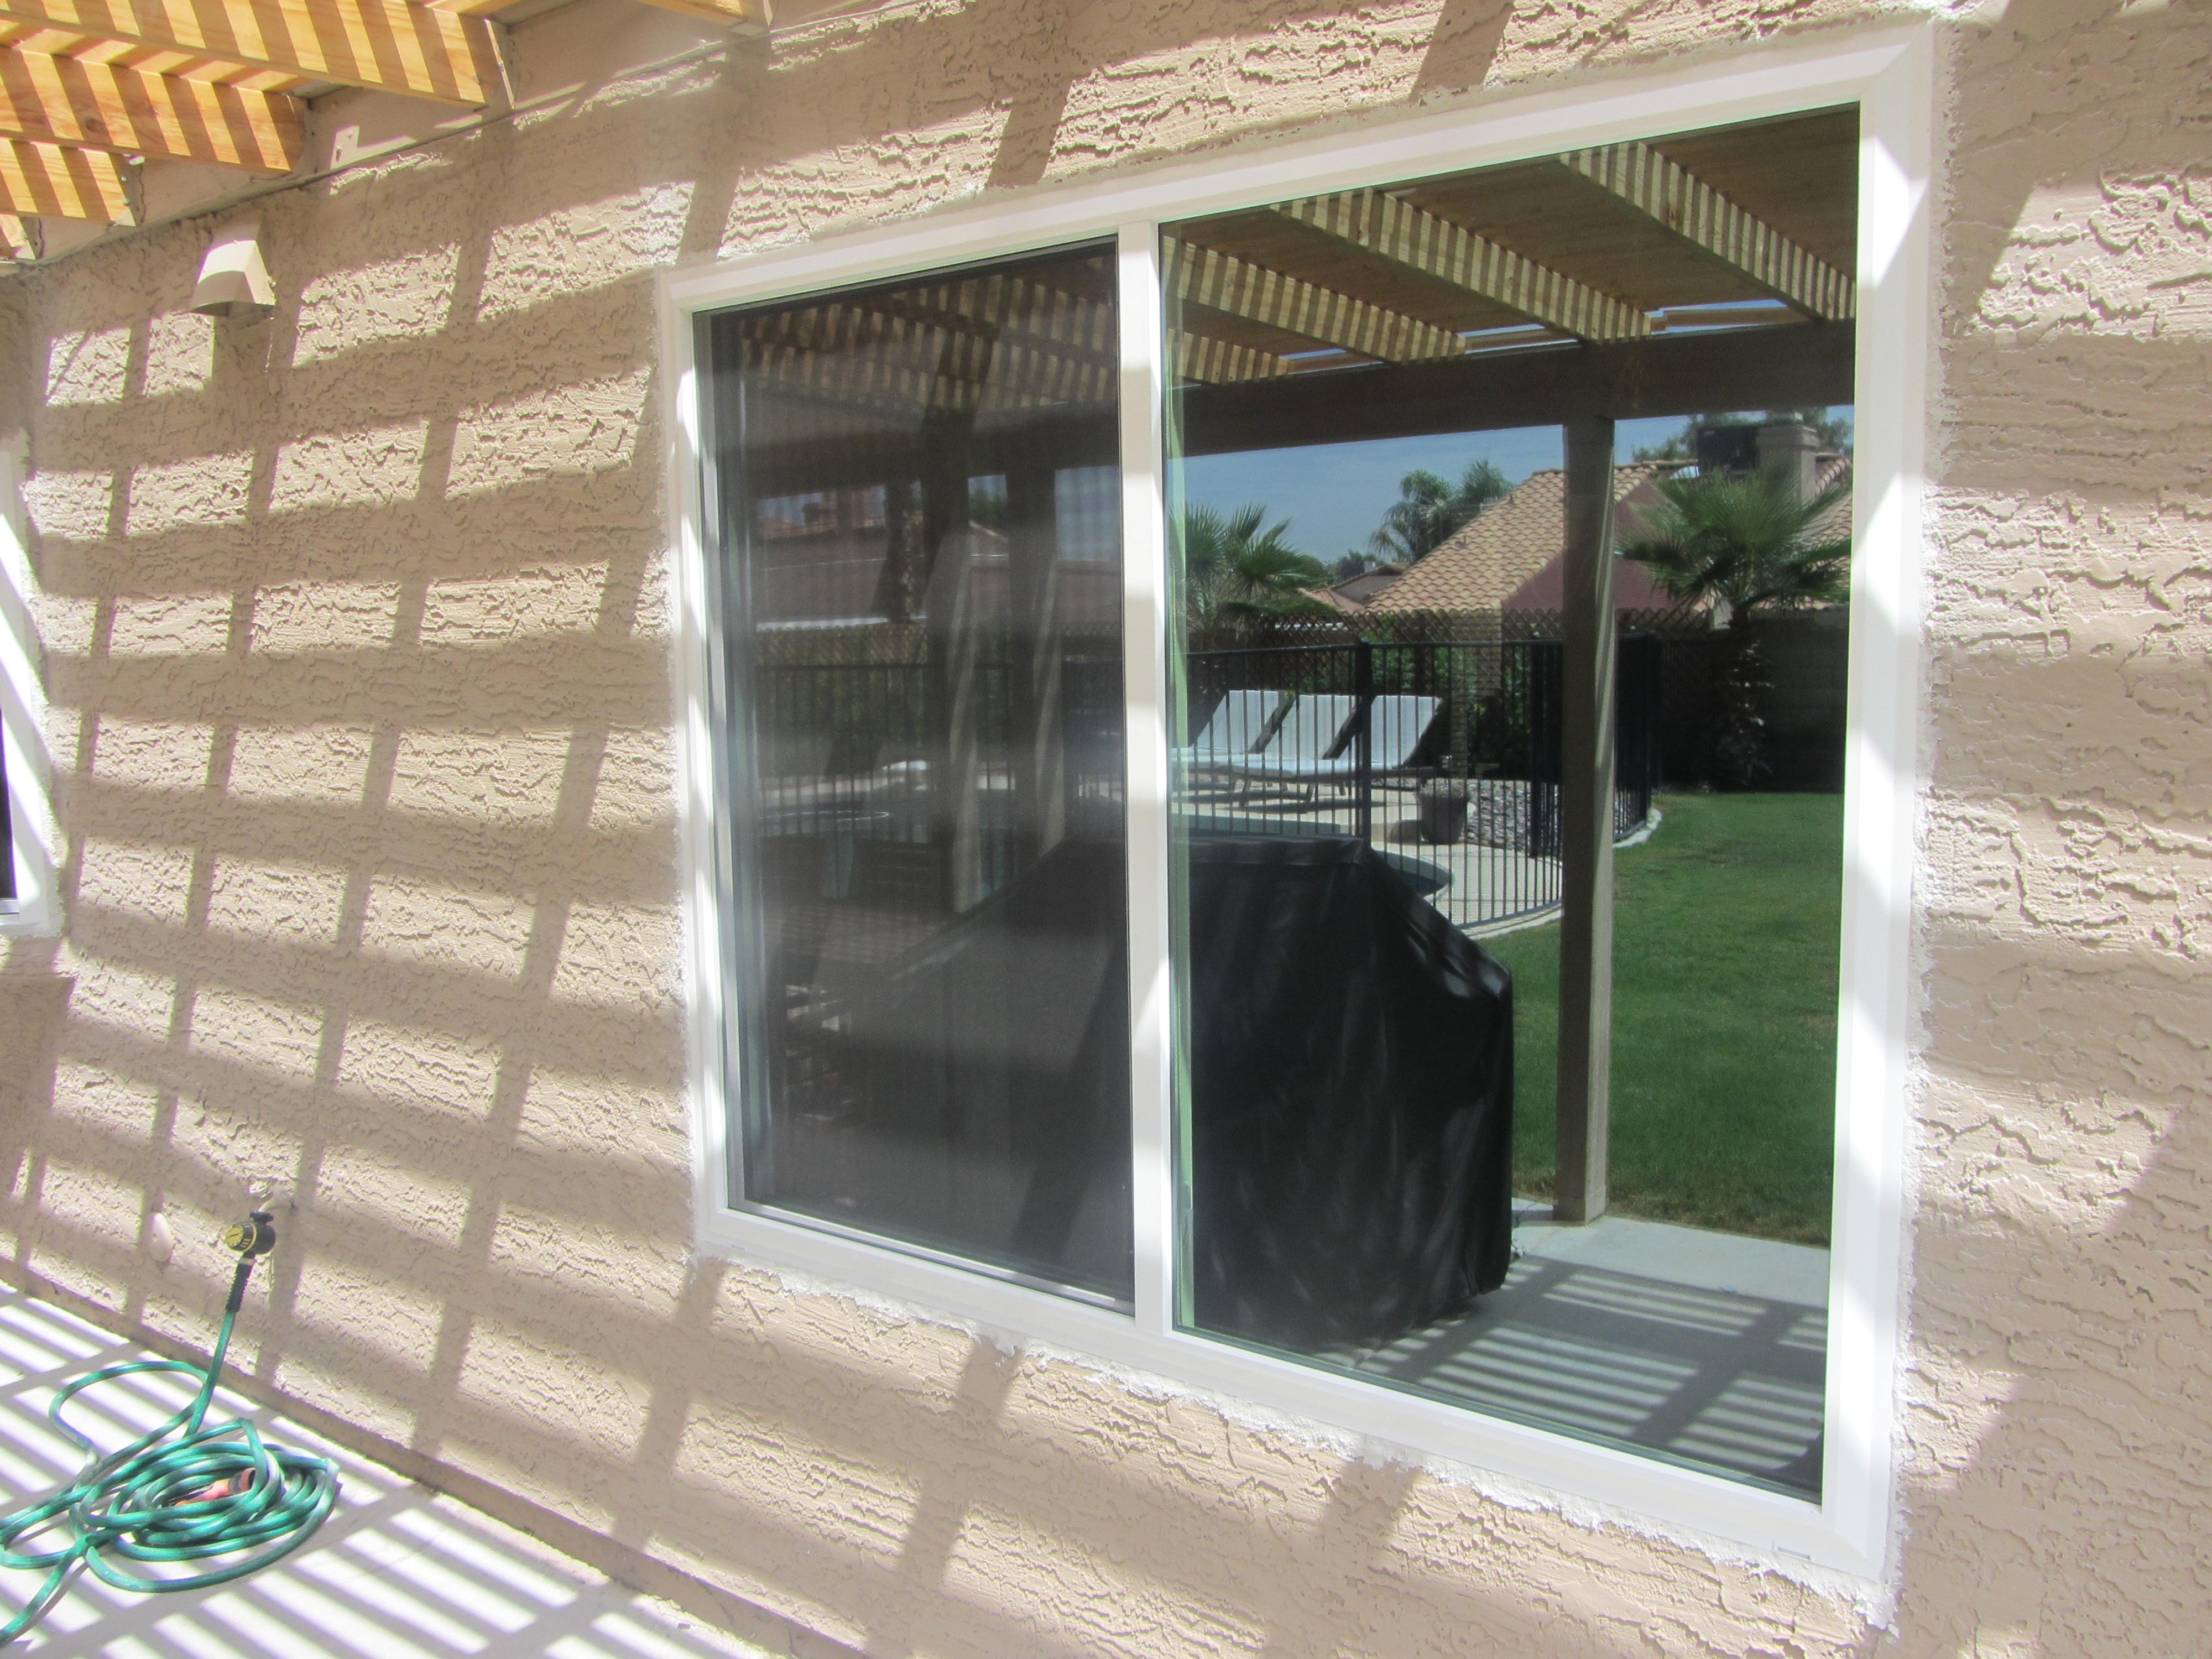 Aegis Replacement Window